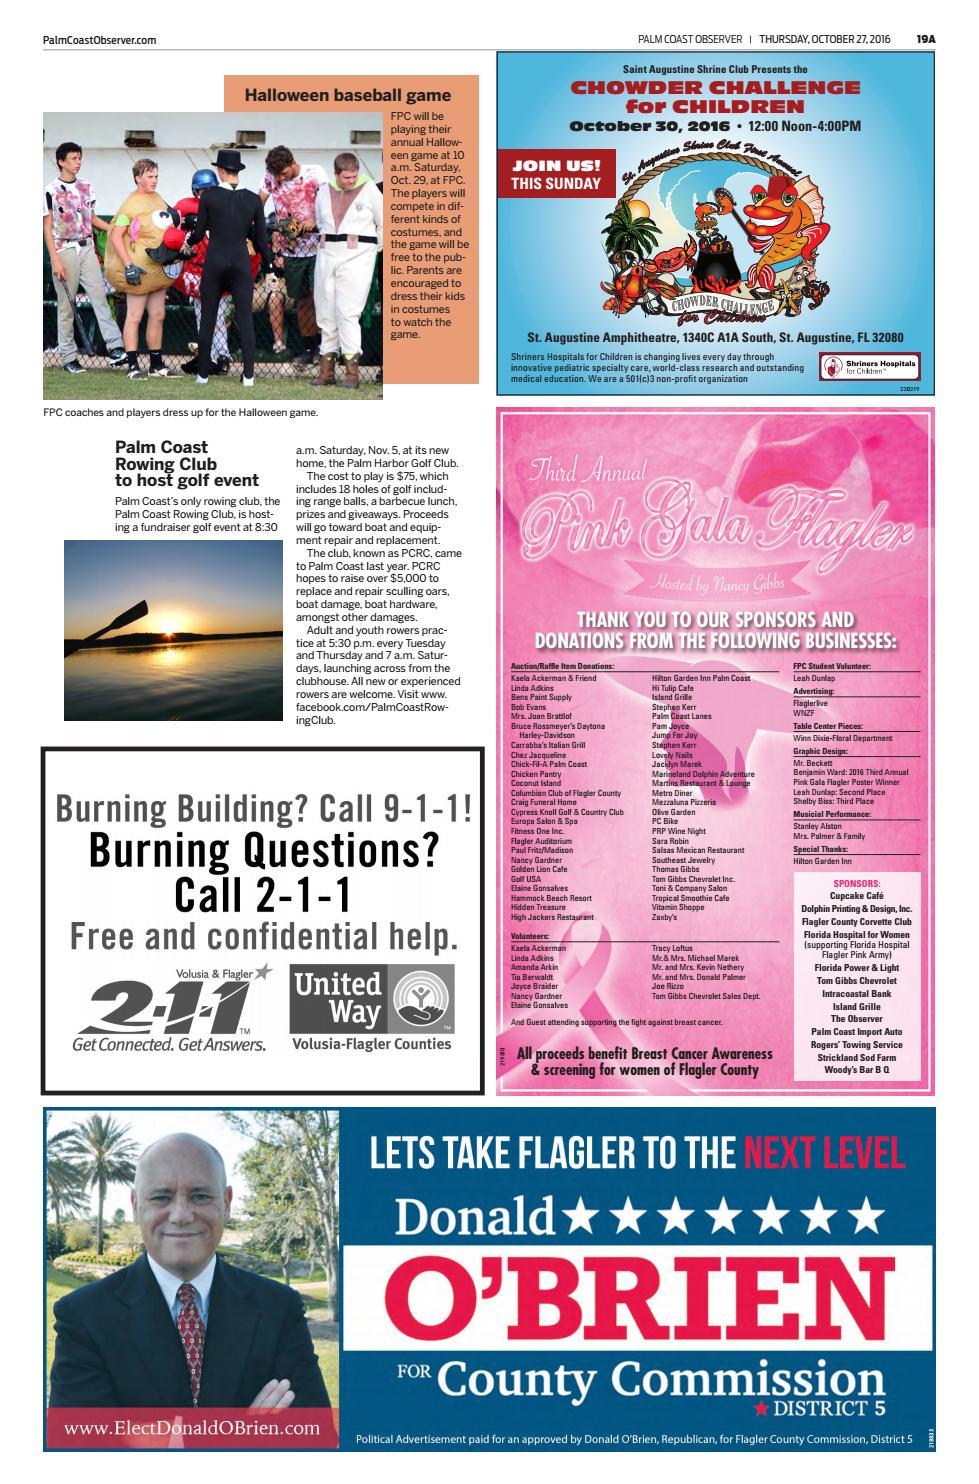 Palm Coast Observer Online 10 27 16 By Brian Mcmillan Issuu